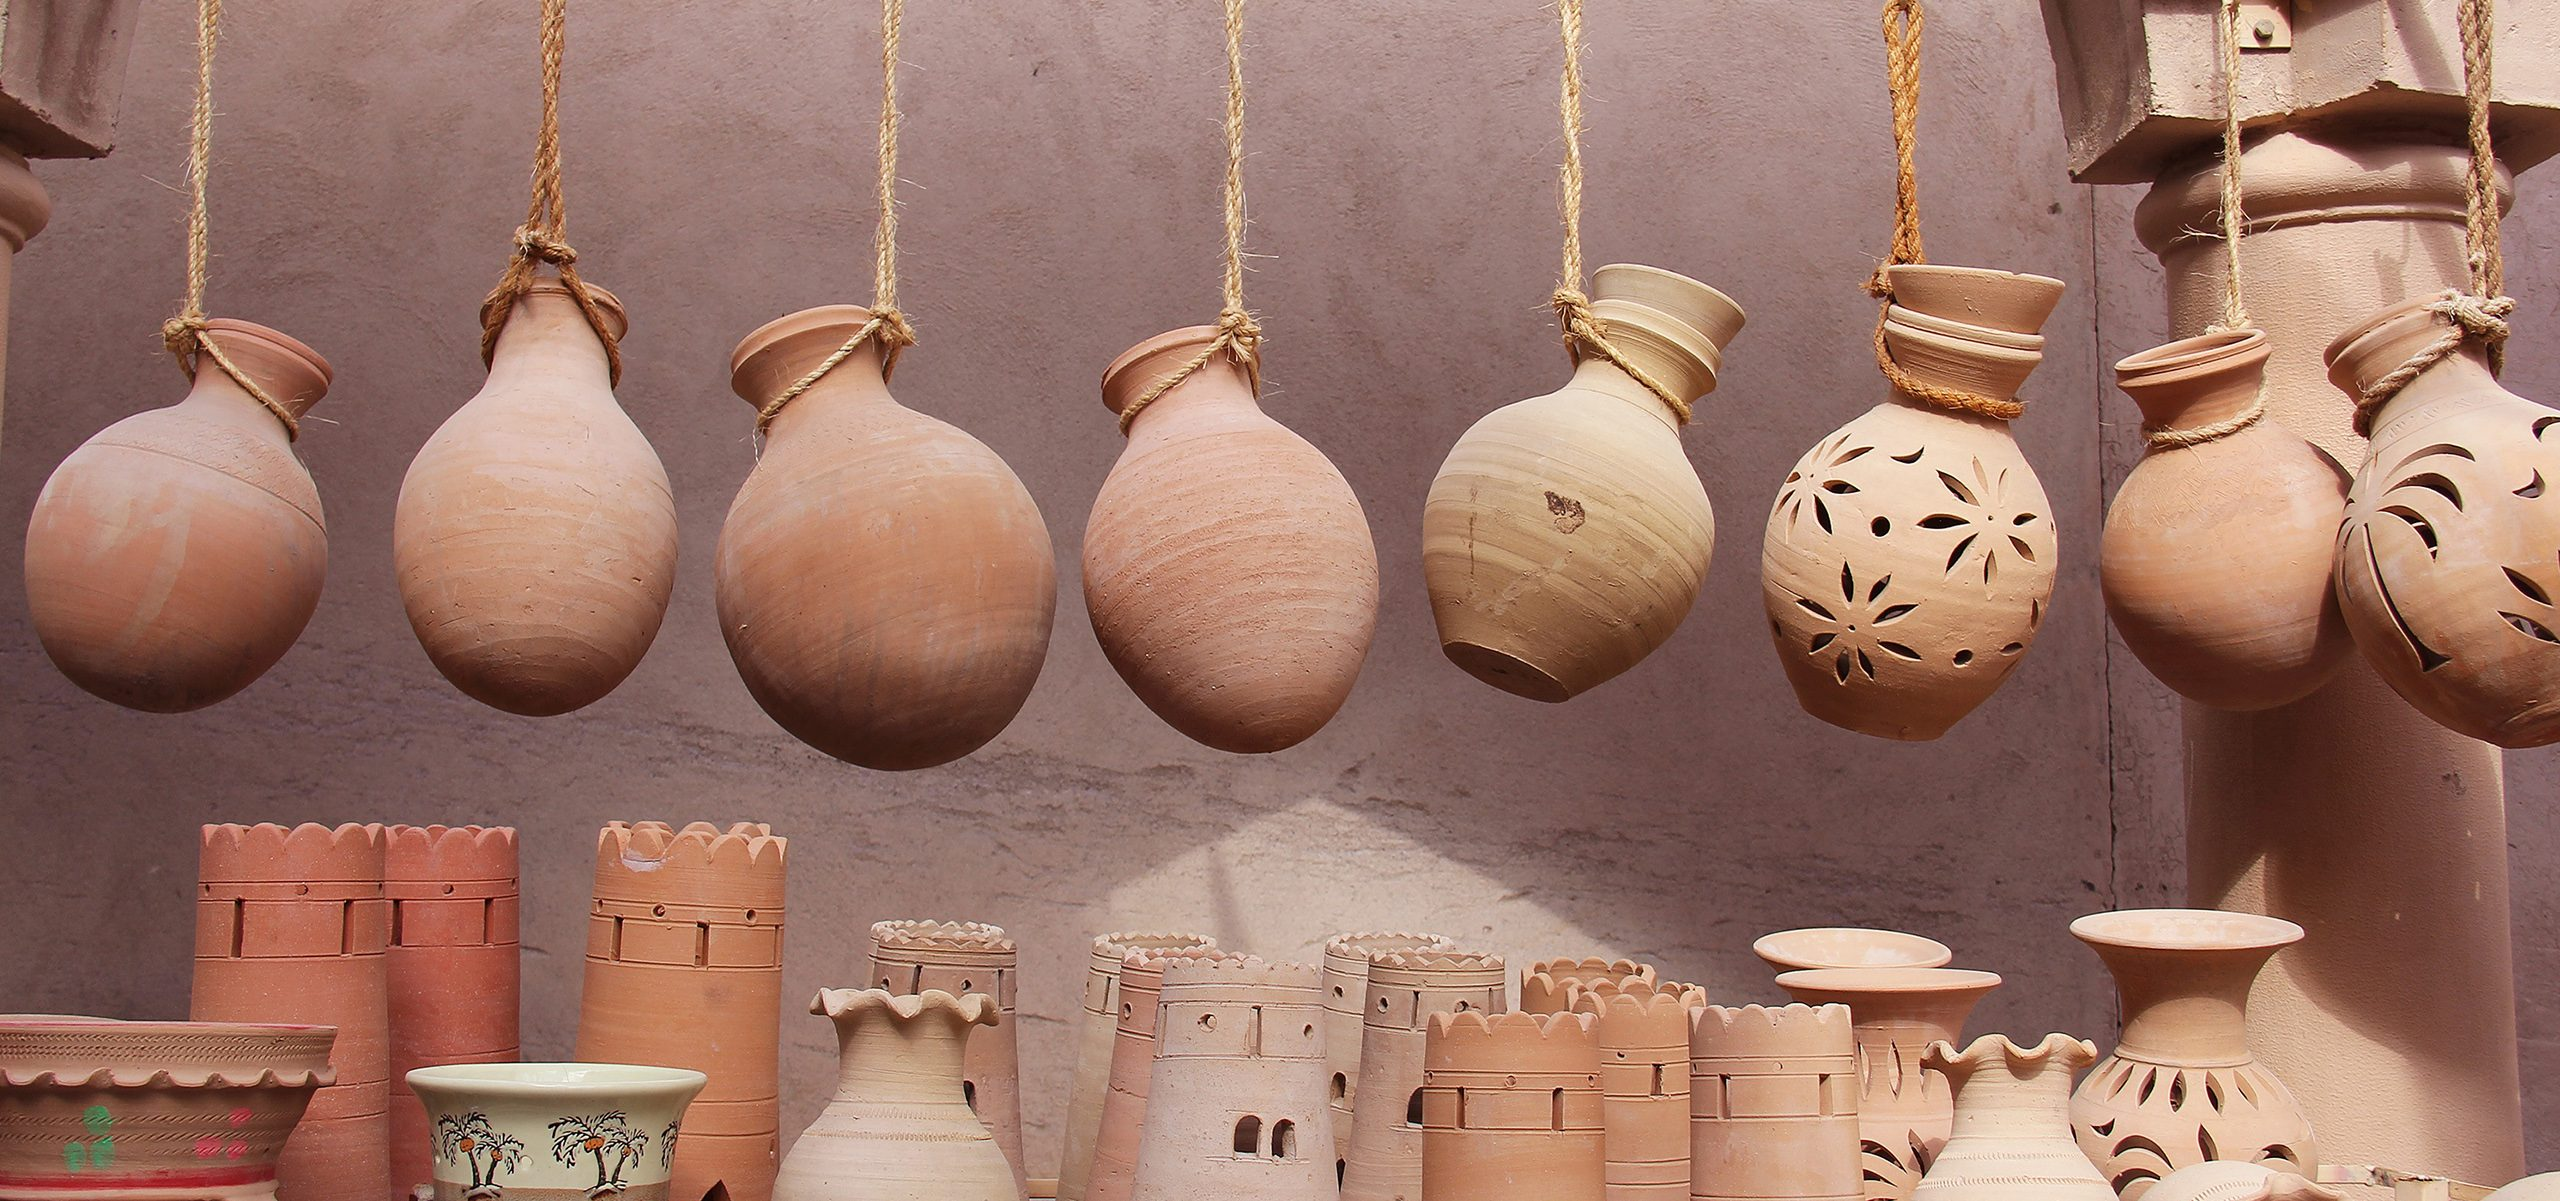 Oman-Nizwa-Souq Market Pottery